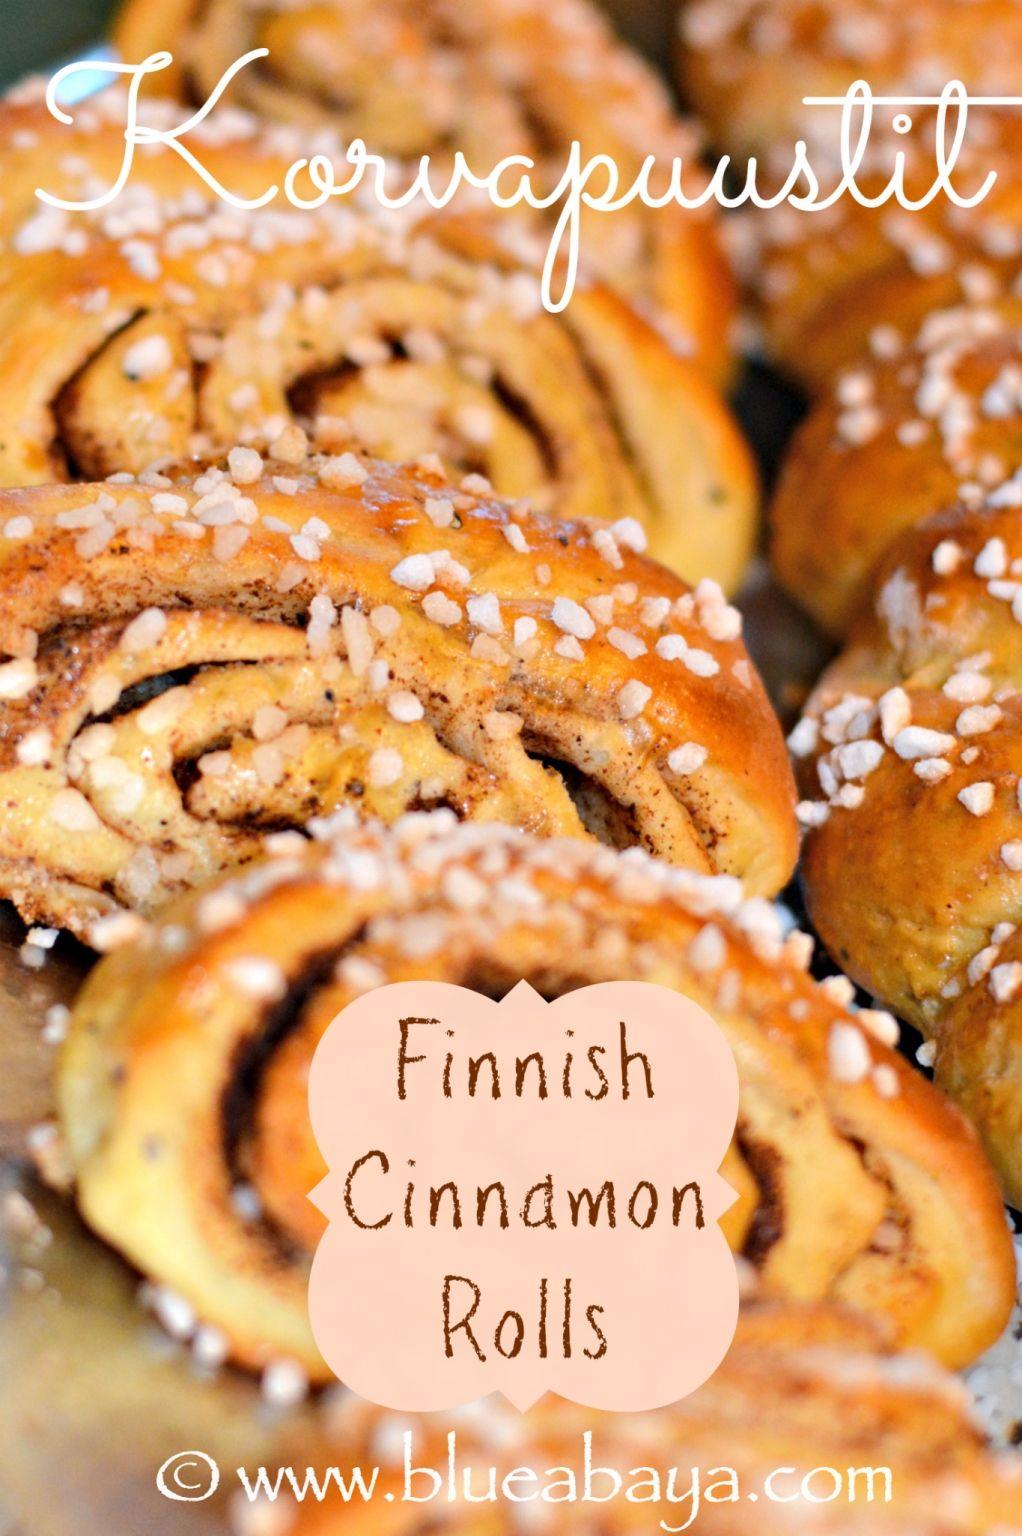 finnish cinnamon rolls